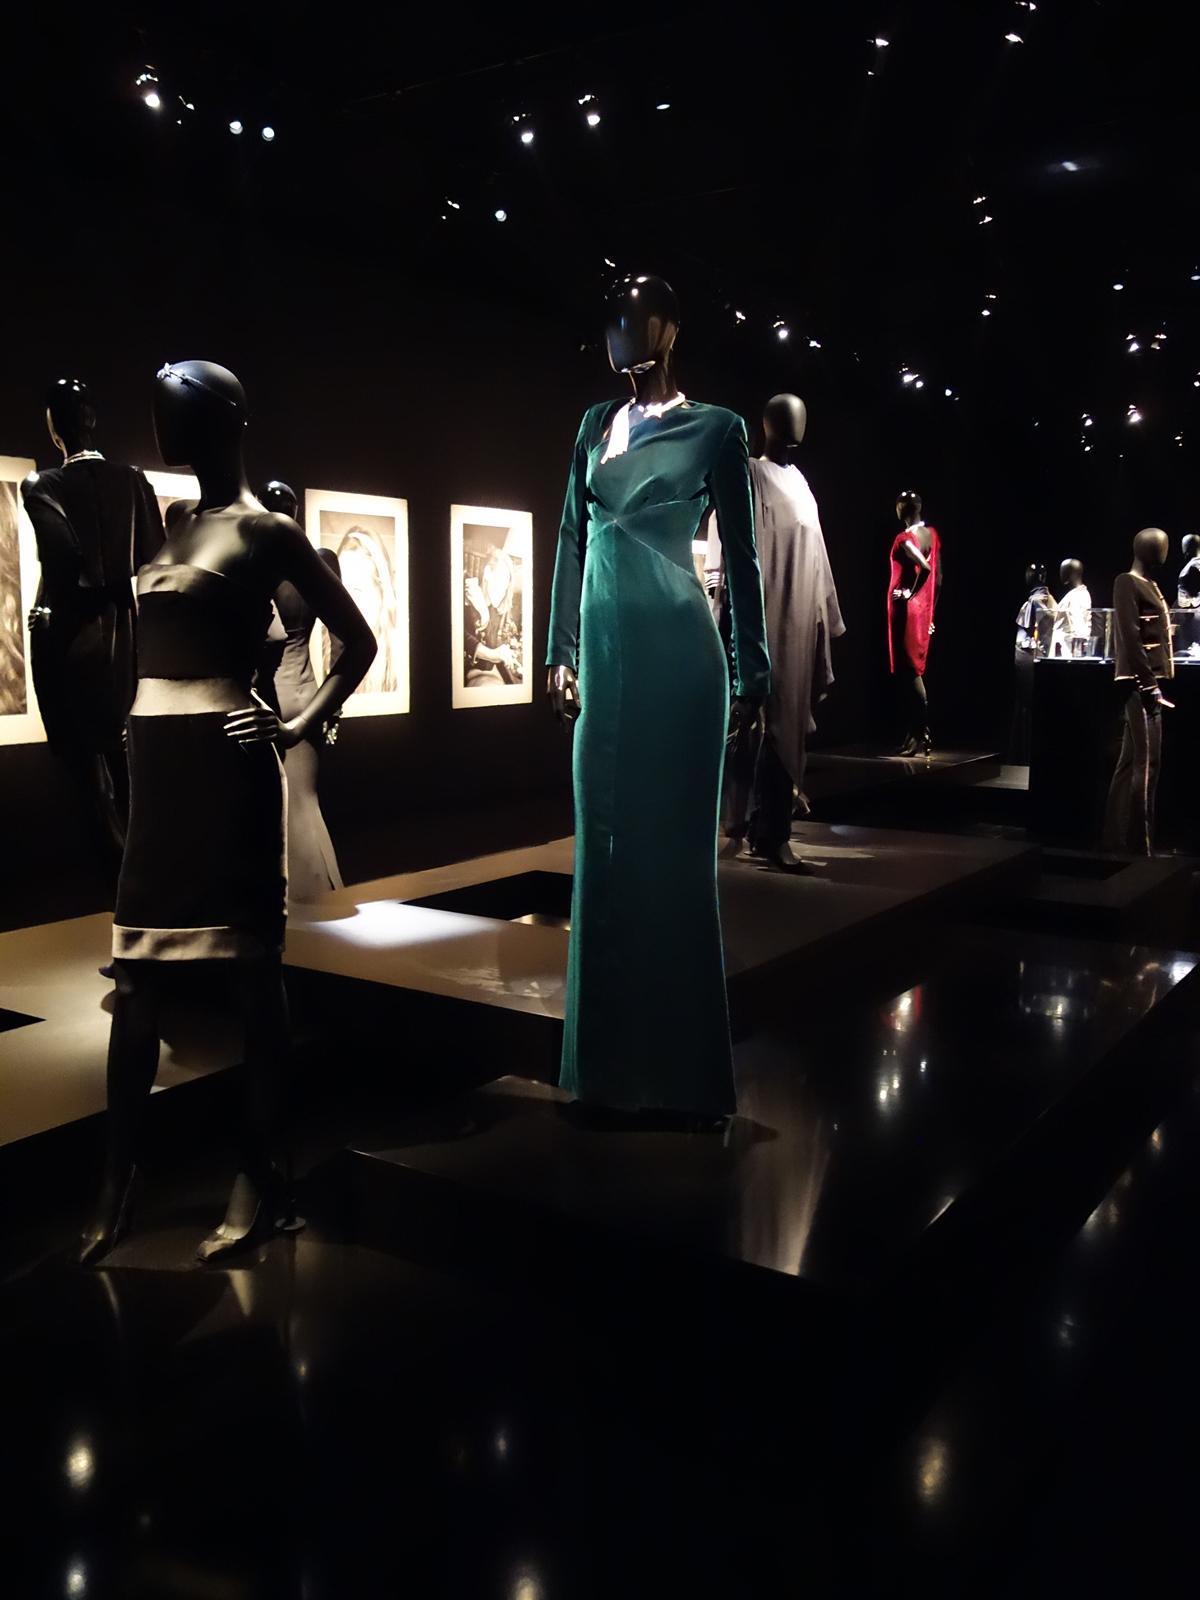 Mademoiselle Prive Chanel exhibition / Saatchi Gallery London via www.fashionedbylove.co.uk British fashion blog